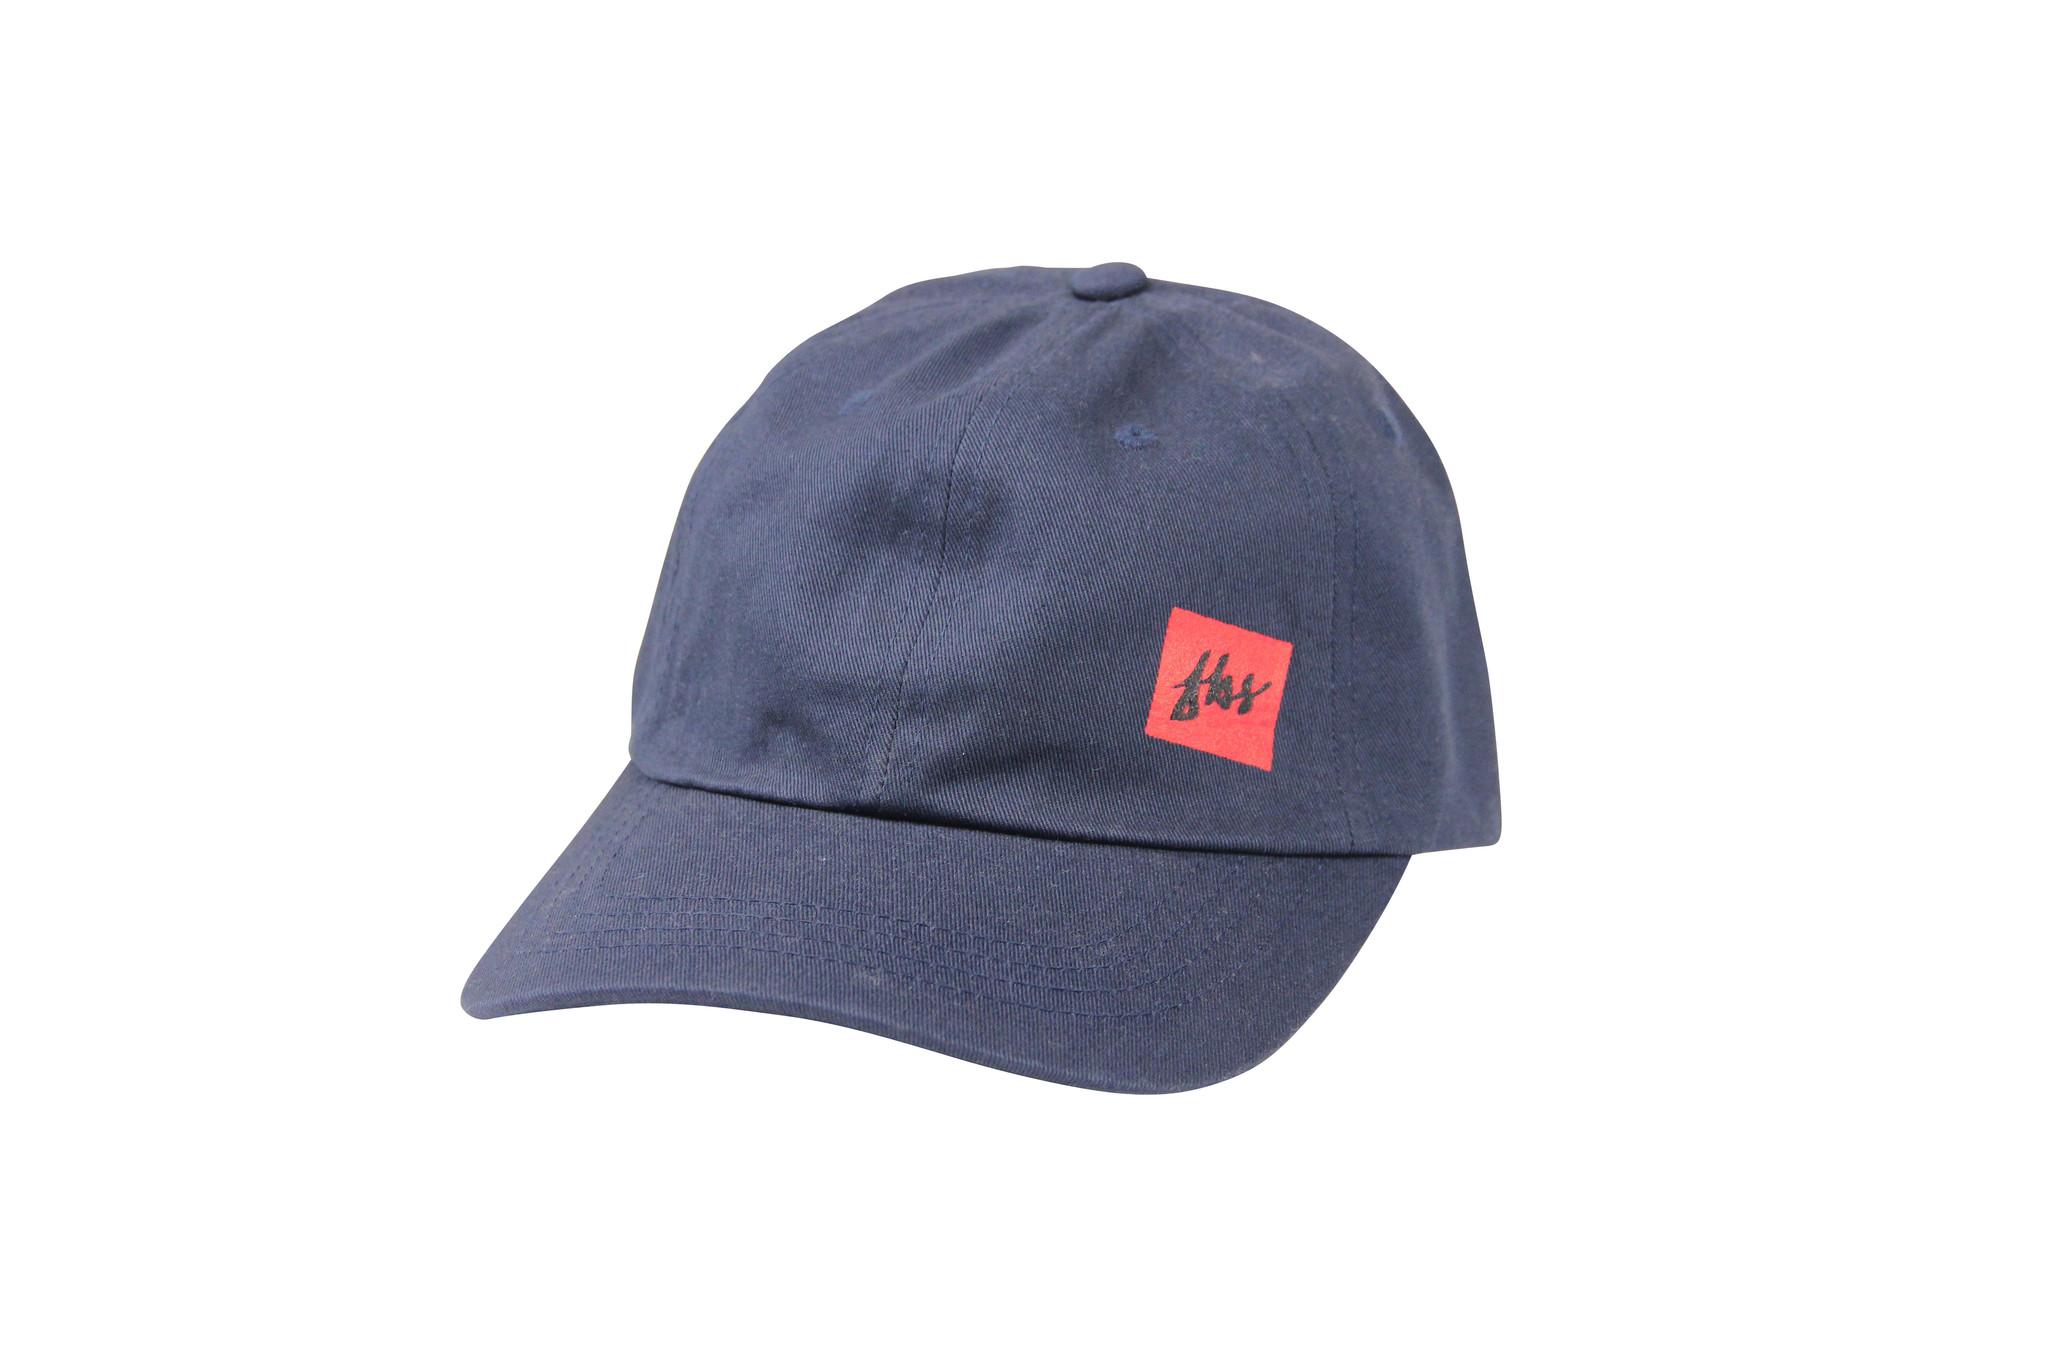 Freedom Boardshop HAT-FREEDOM BOX LOW STRAP